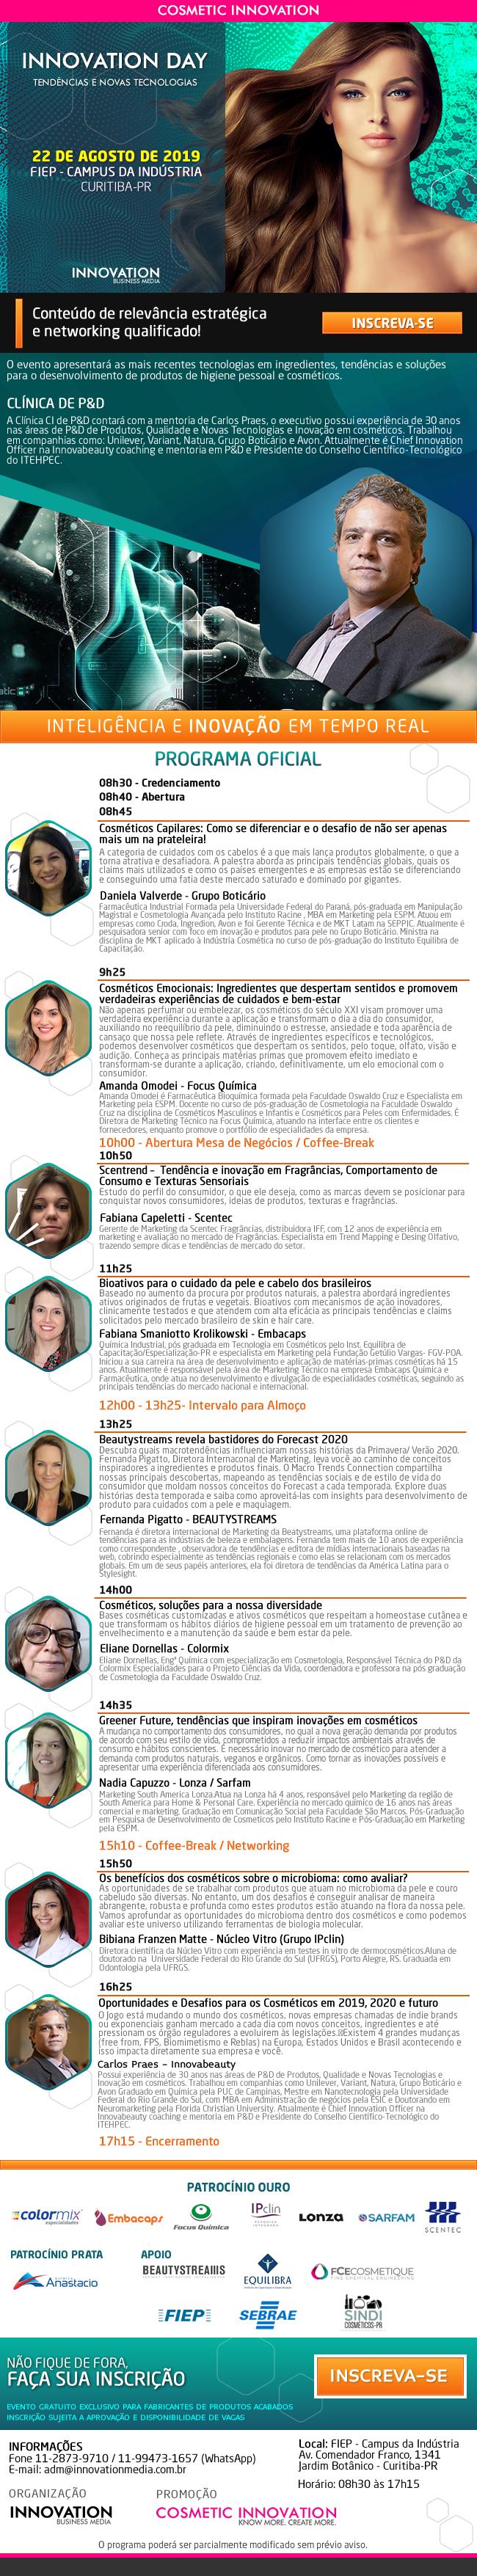 Innovation Day Curitiba